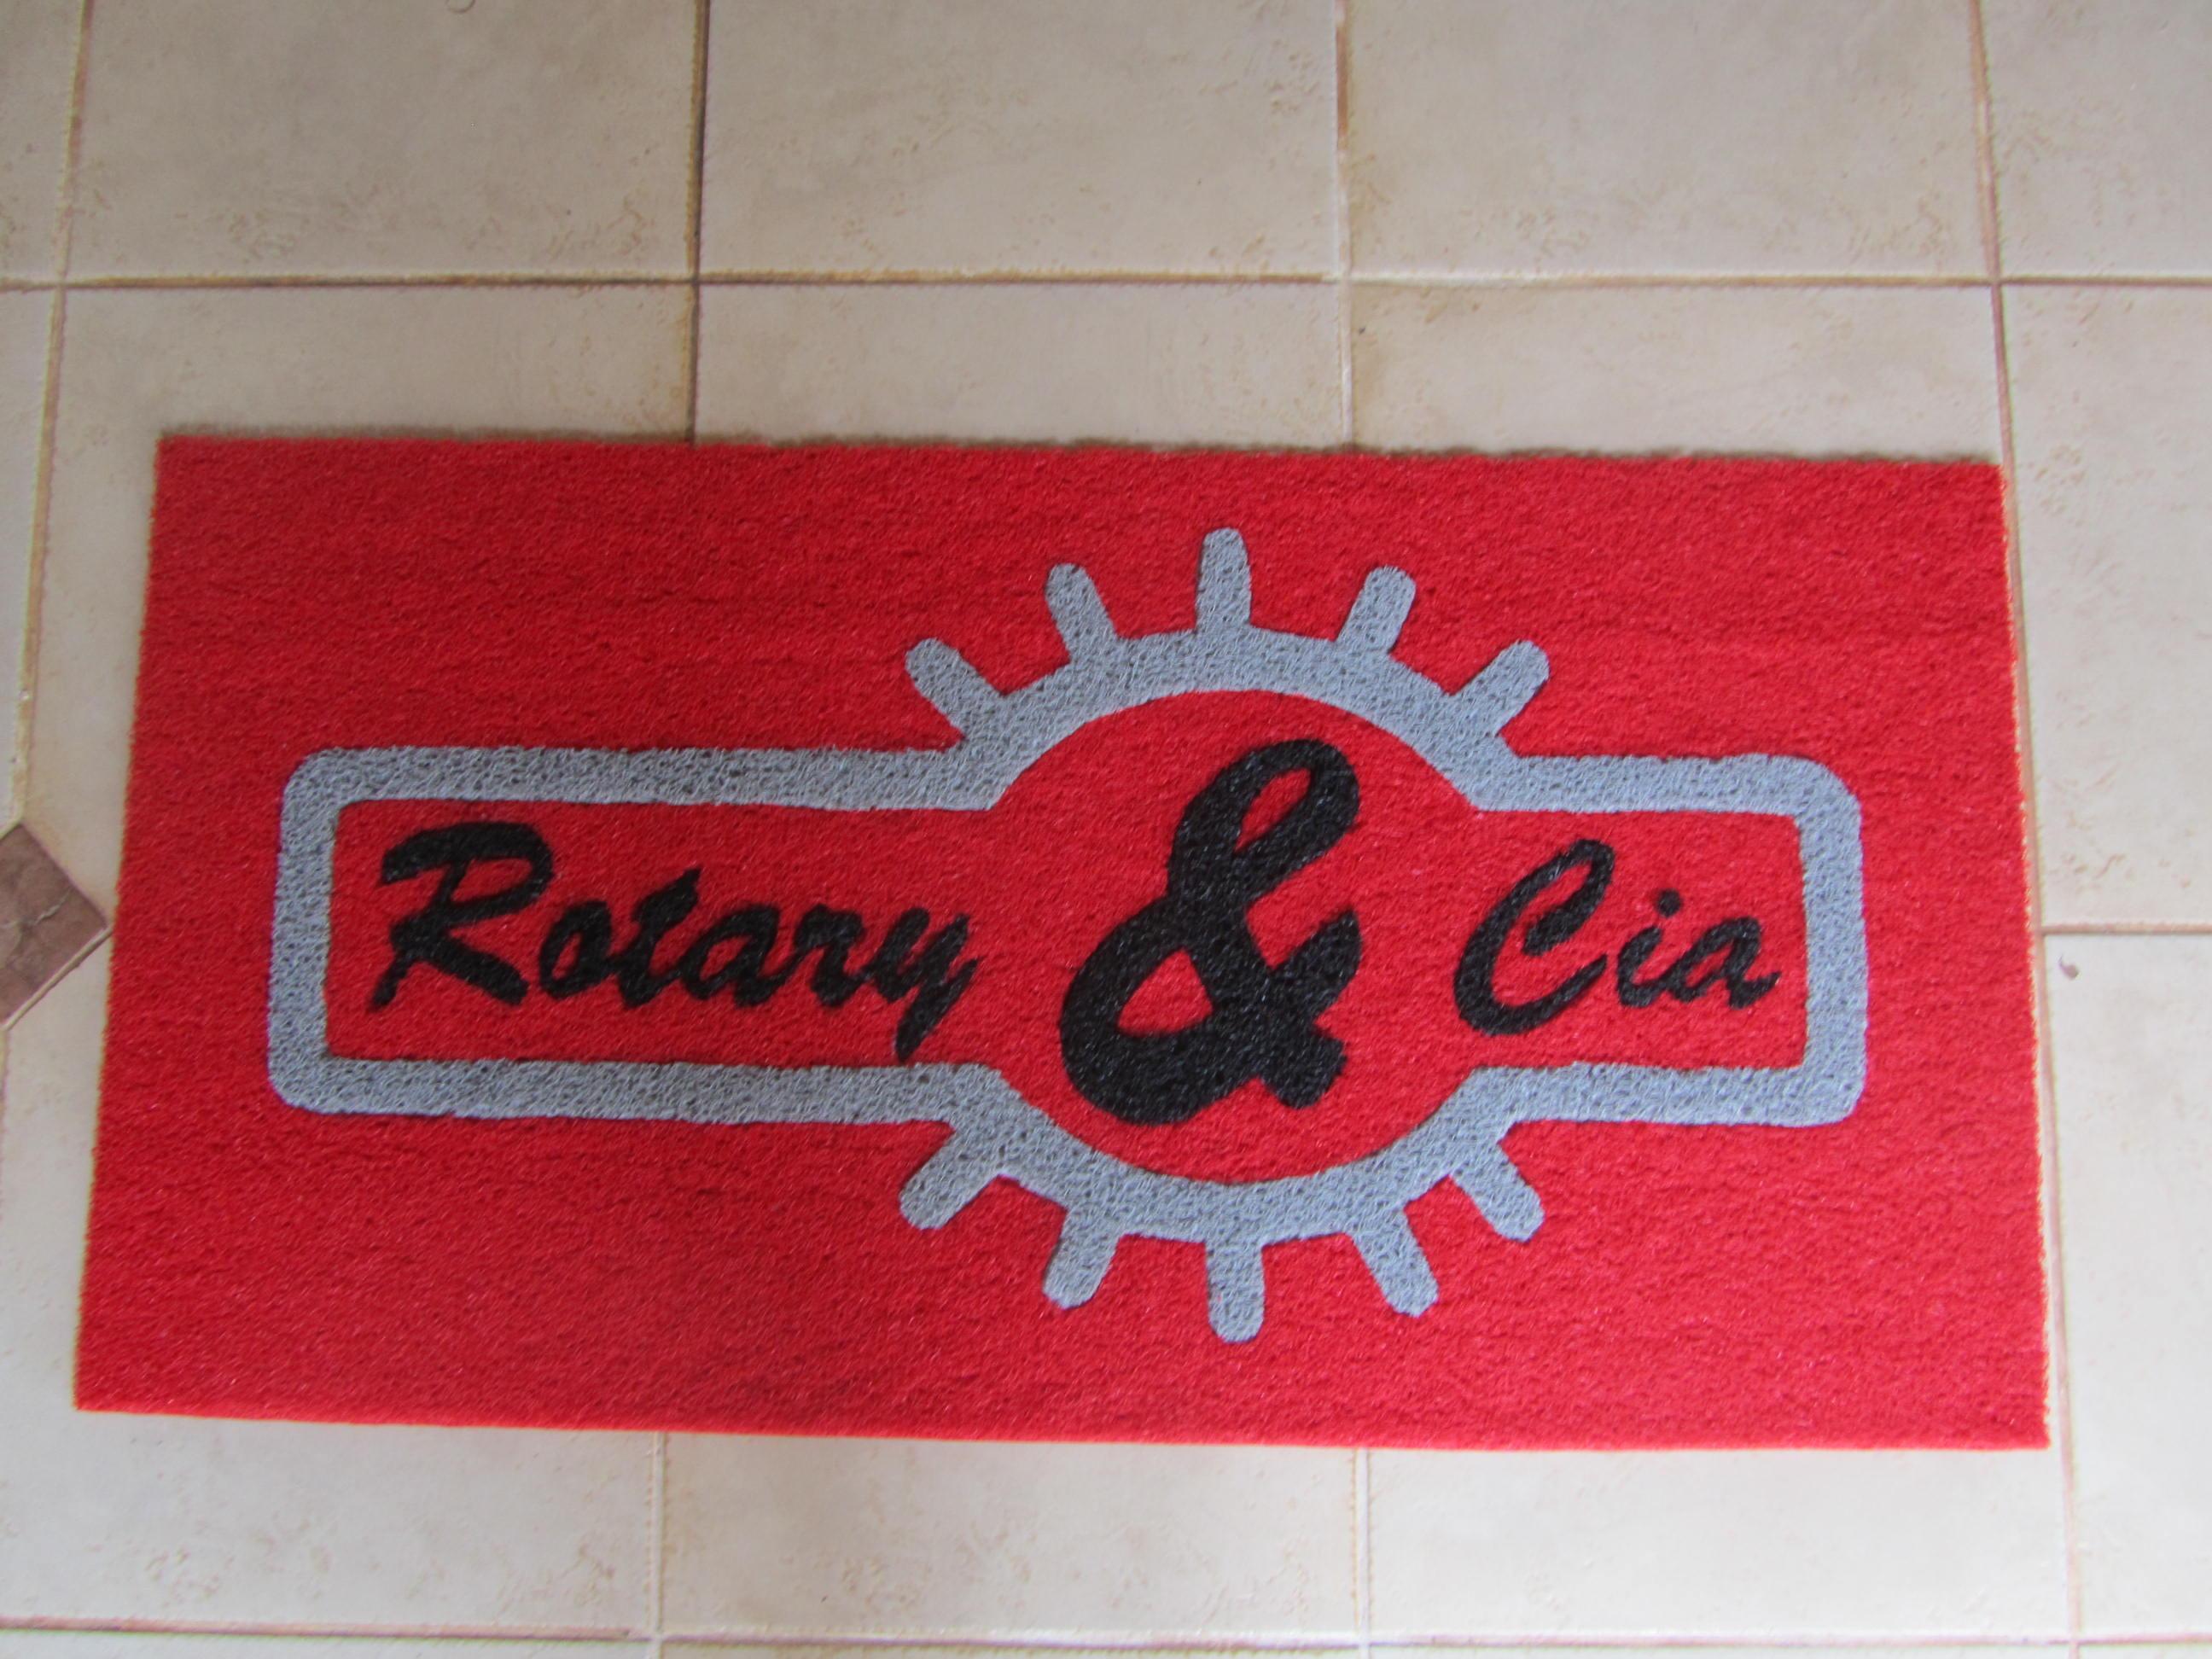 Rotary & Cia.